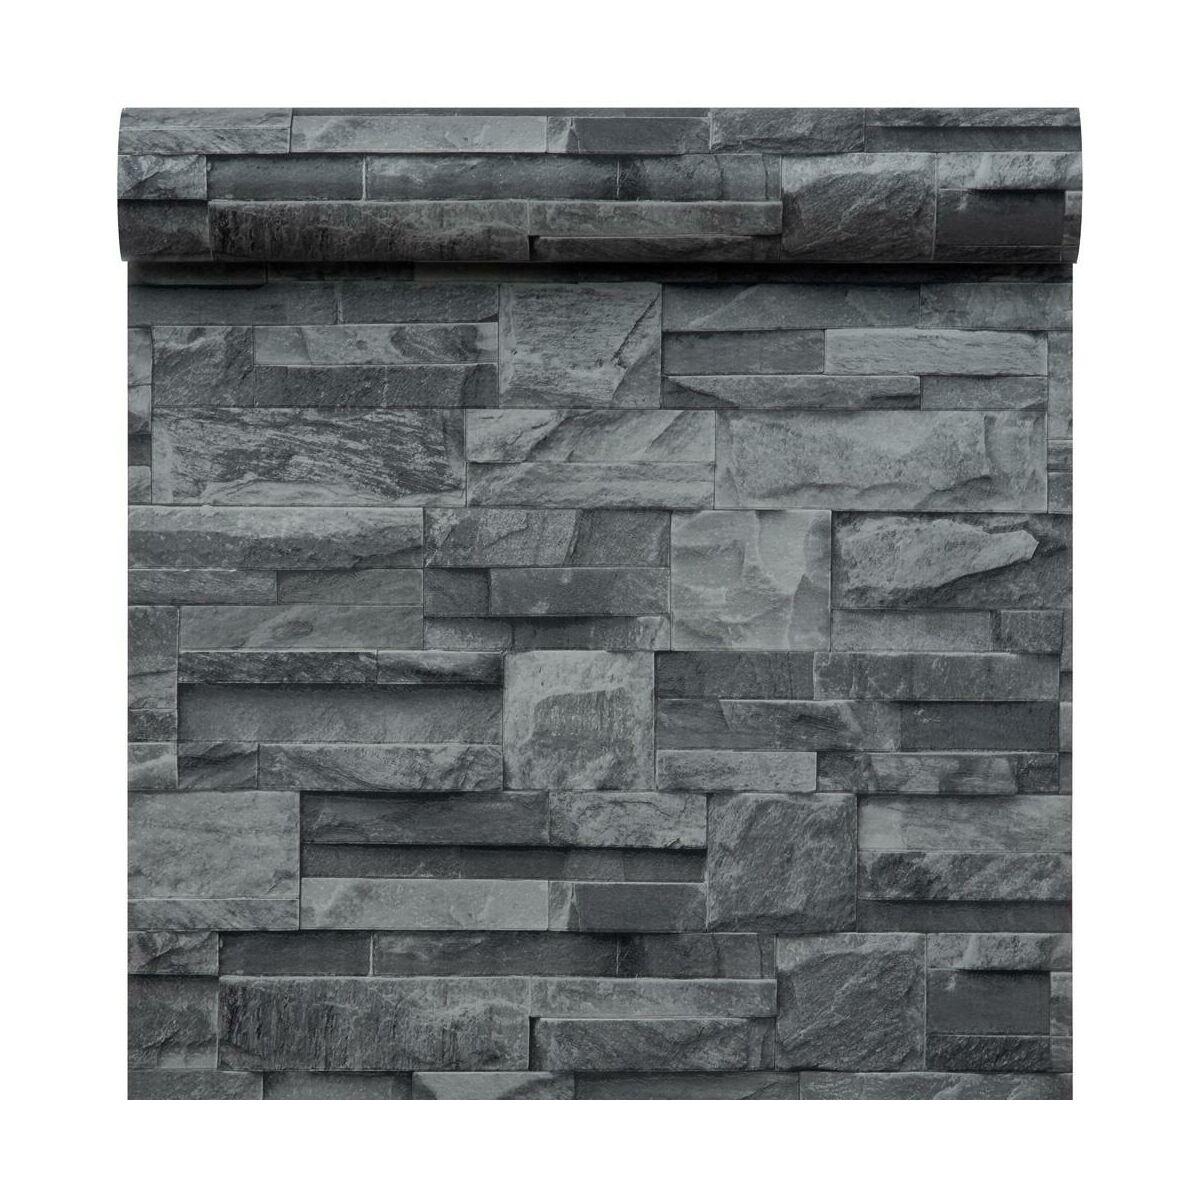 tapeta granit tapety w atrakcyjnej cenie w sklepach. Black Bedroom Furniture Sets. Home Design Ideas